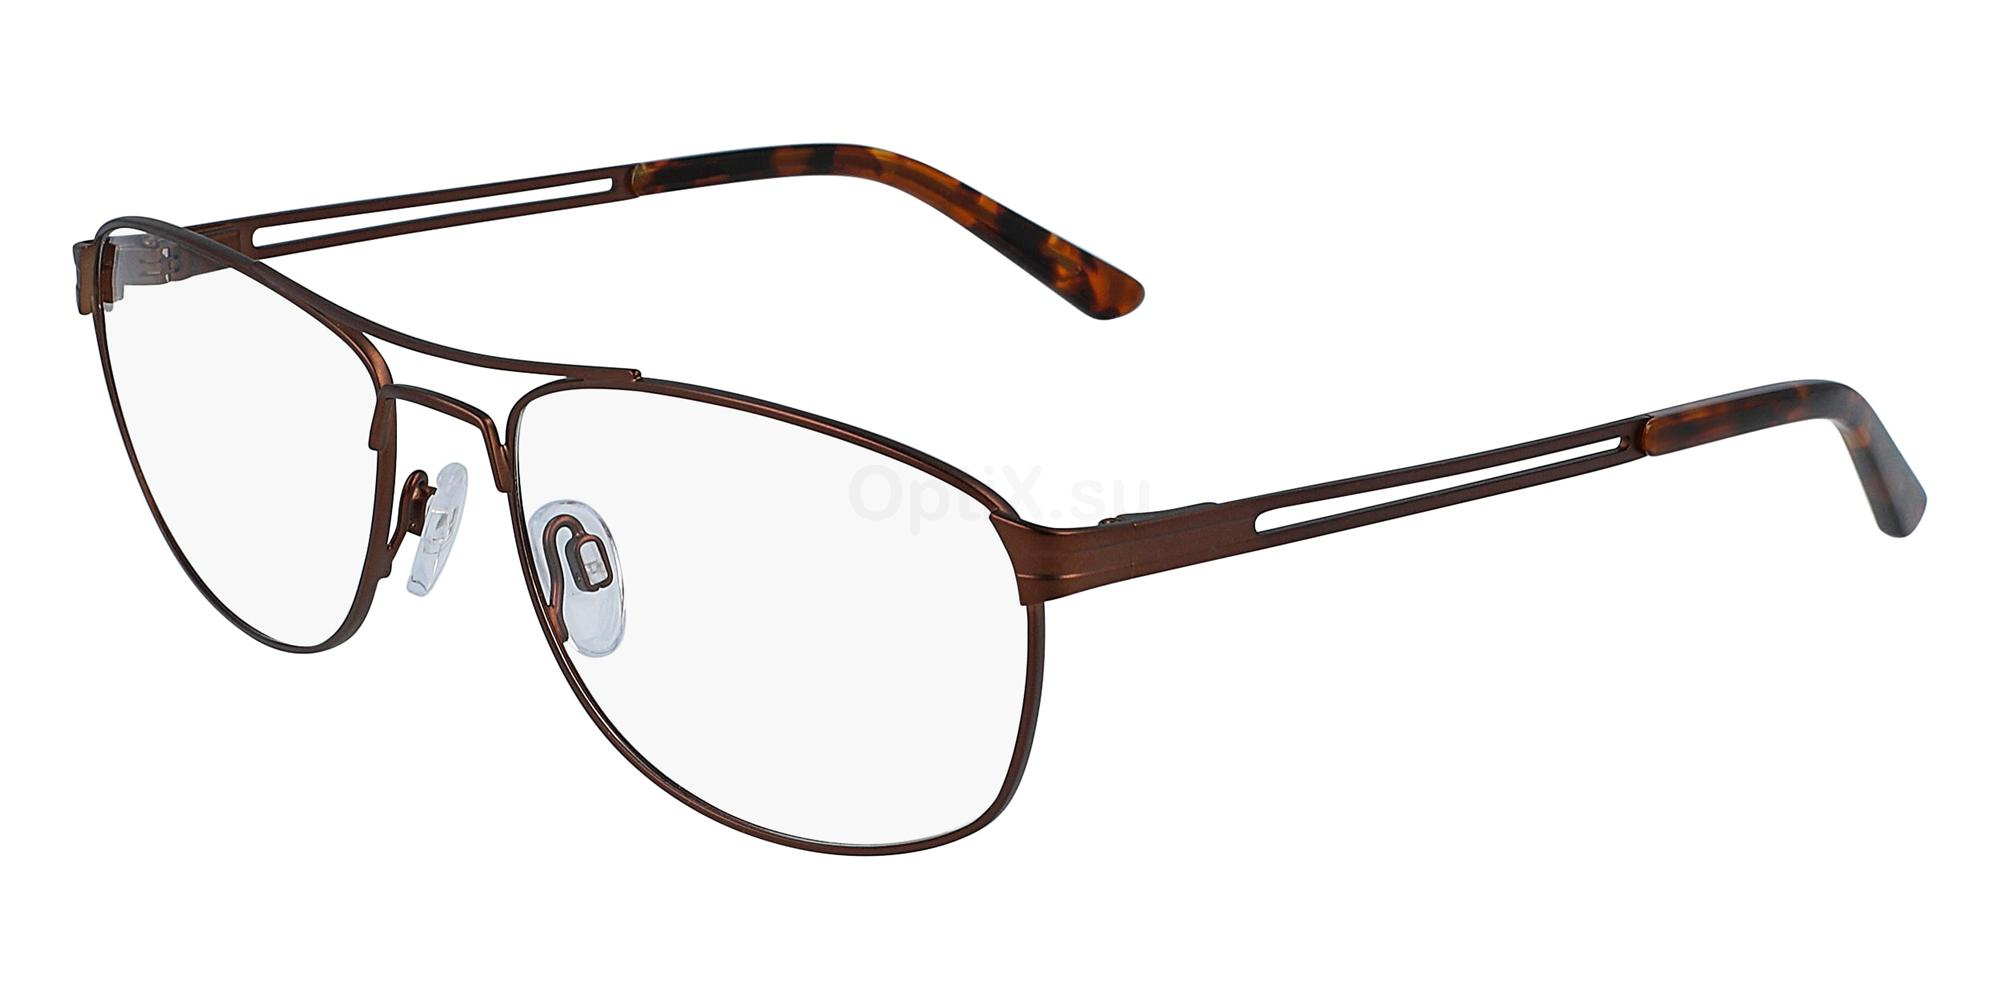 210 SK2831 ATTITYD Glasses, Skaga